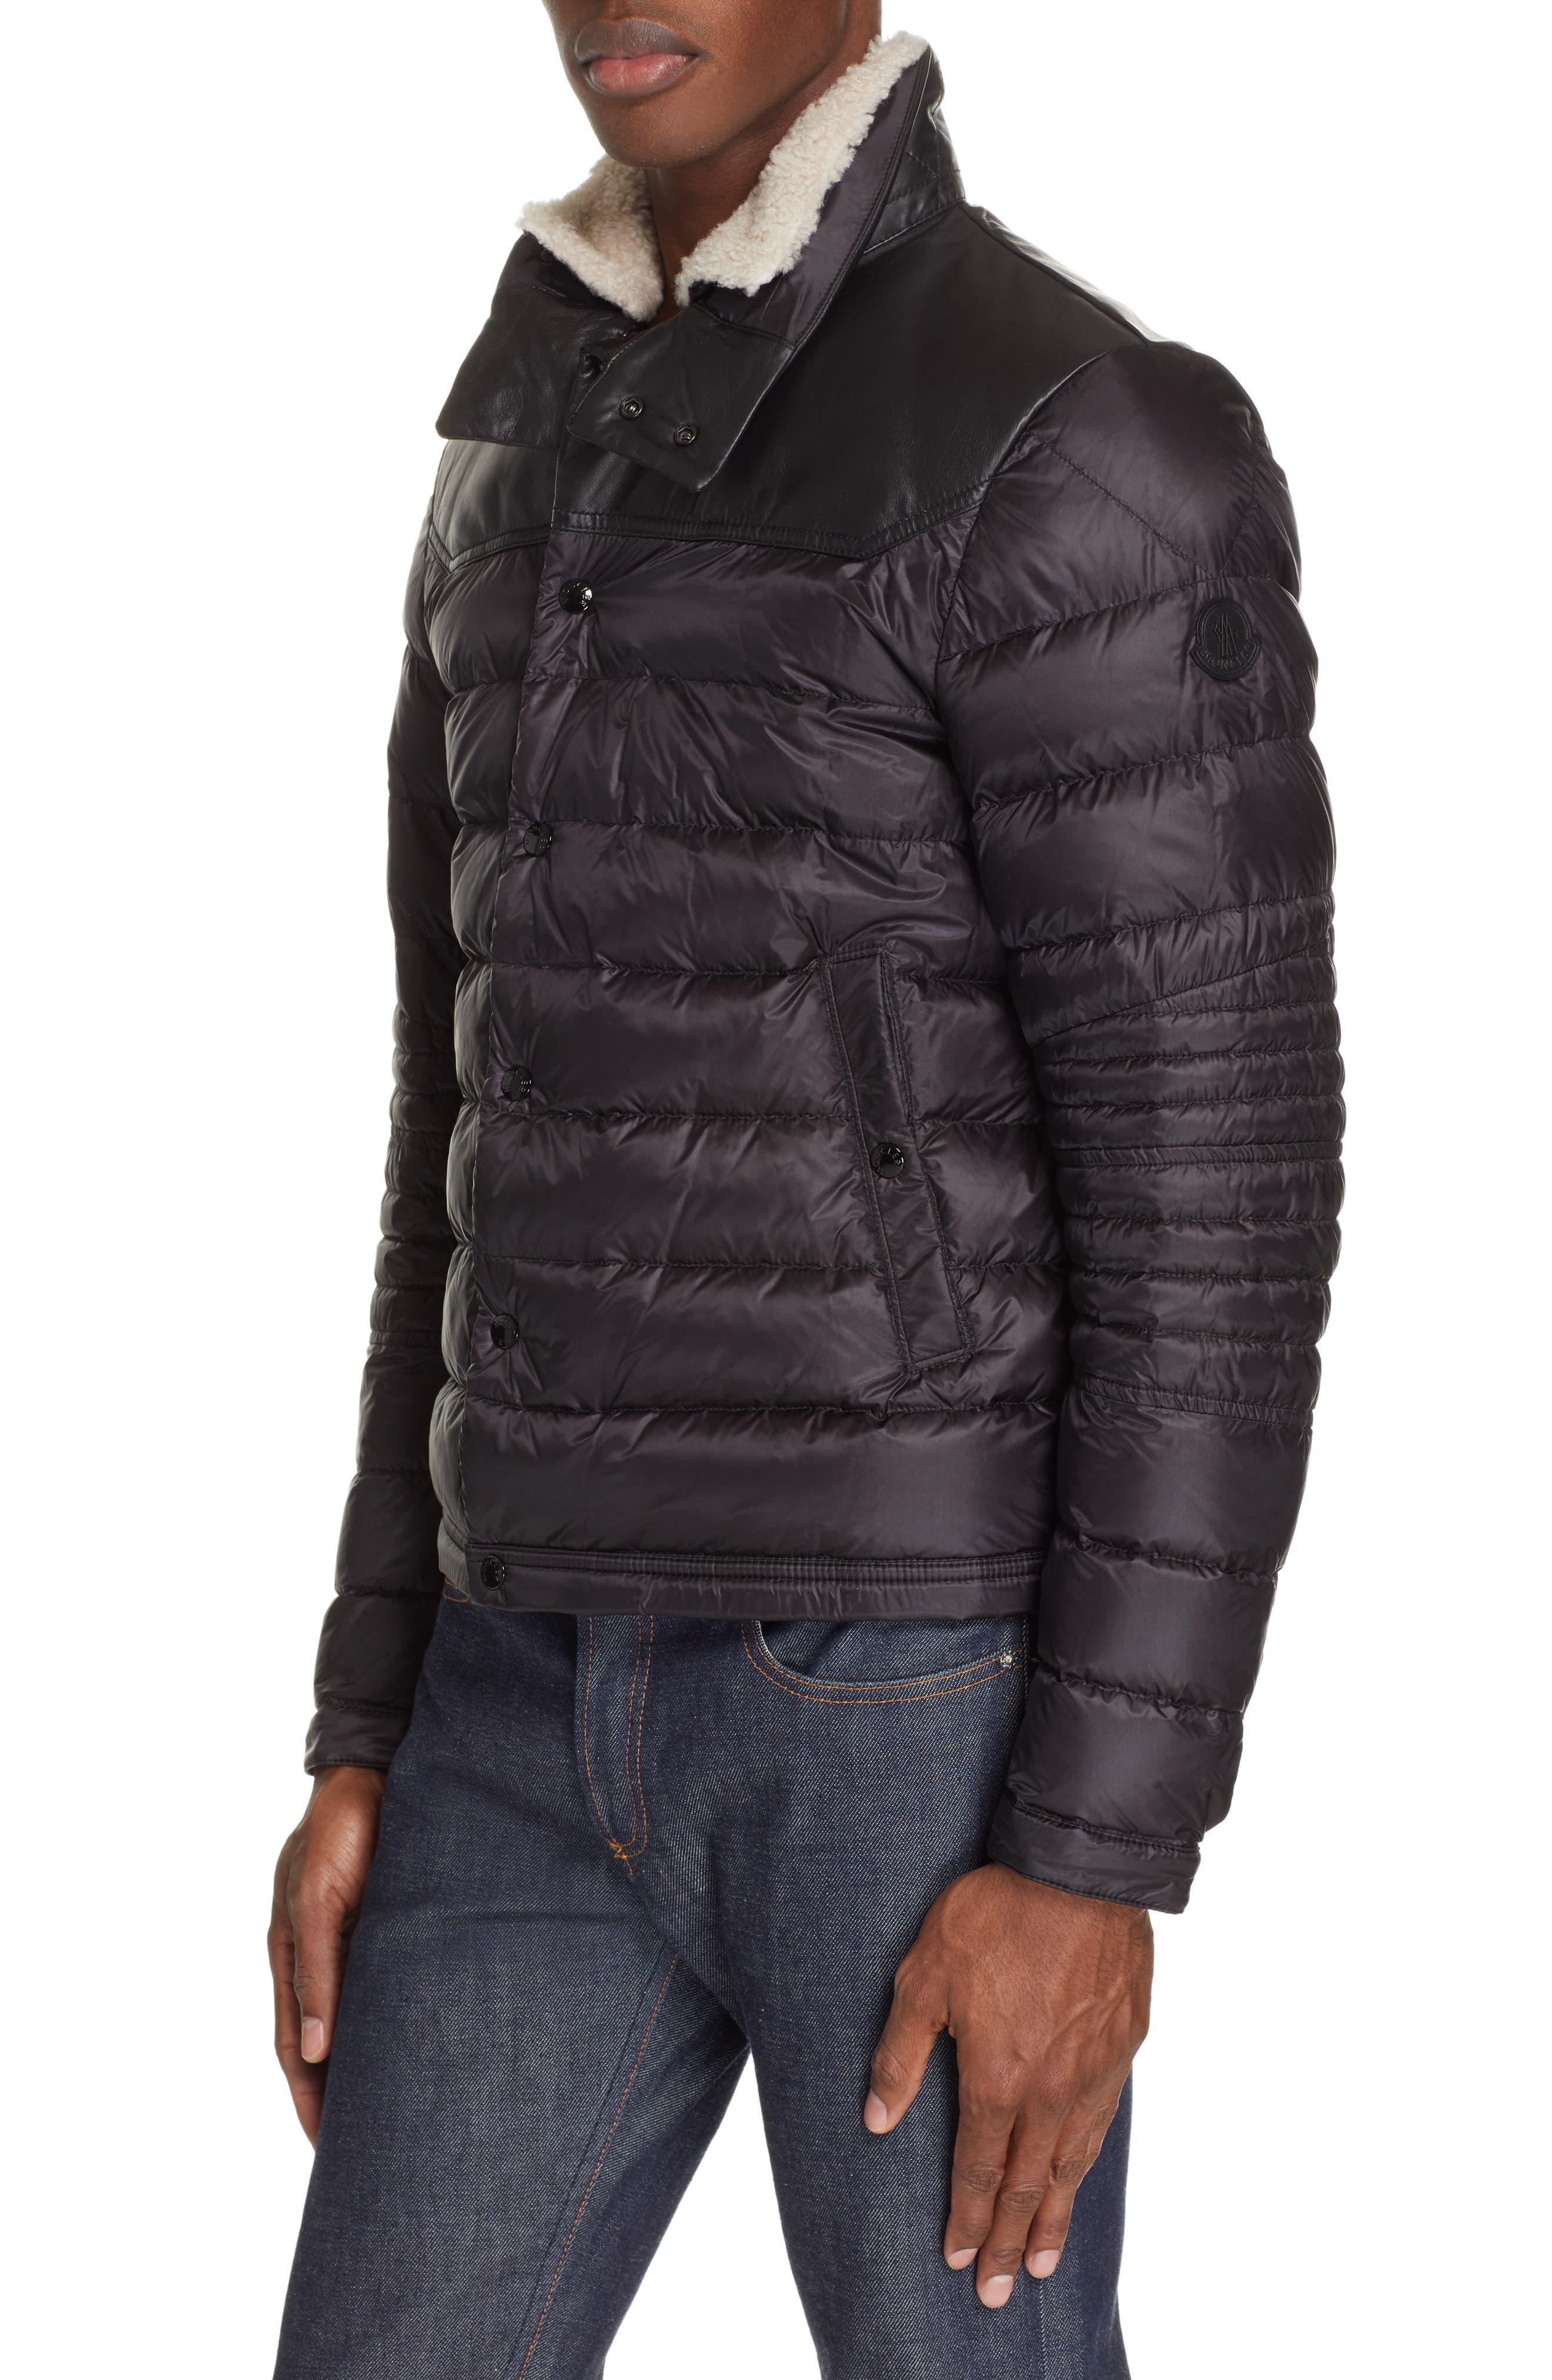 MONCLER, Vasserot Genuine Shearling Collar Jacket, Main thumbnail 1, color, BLACK